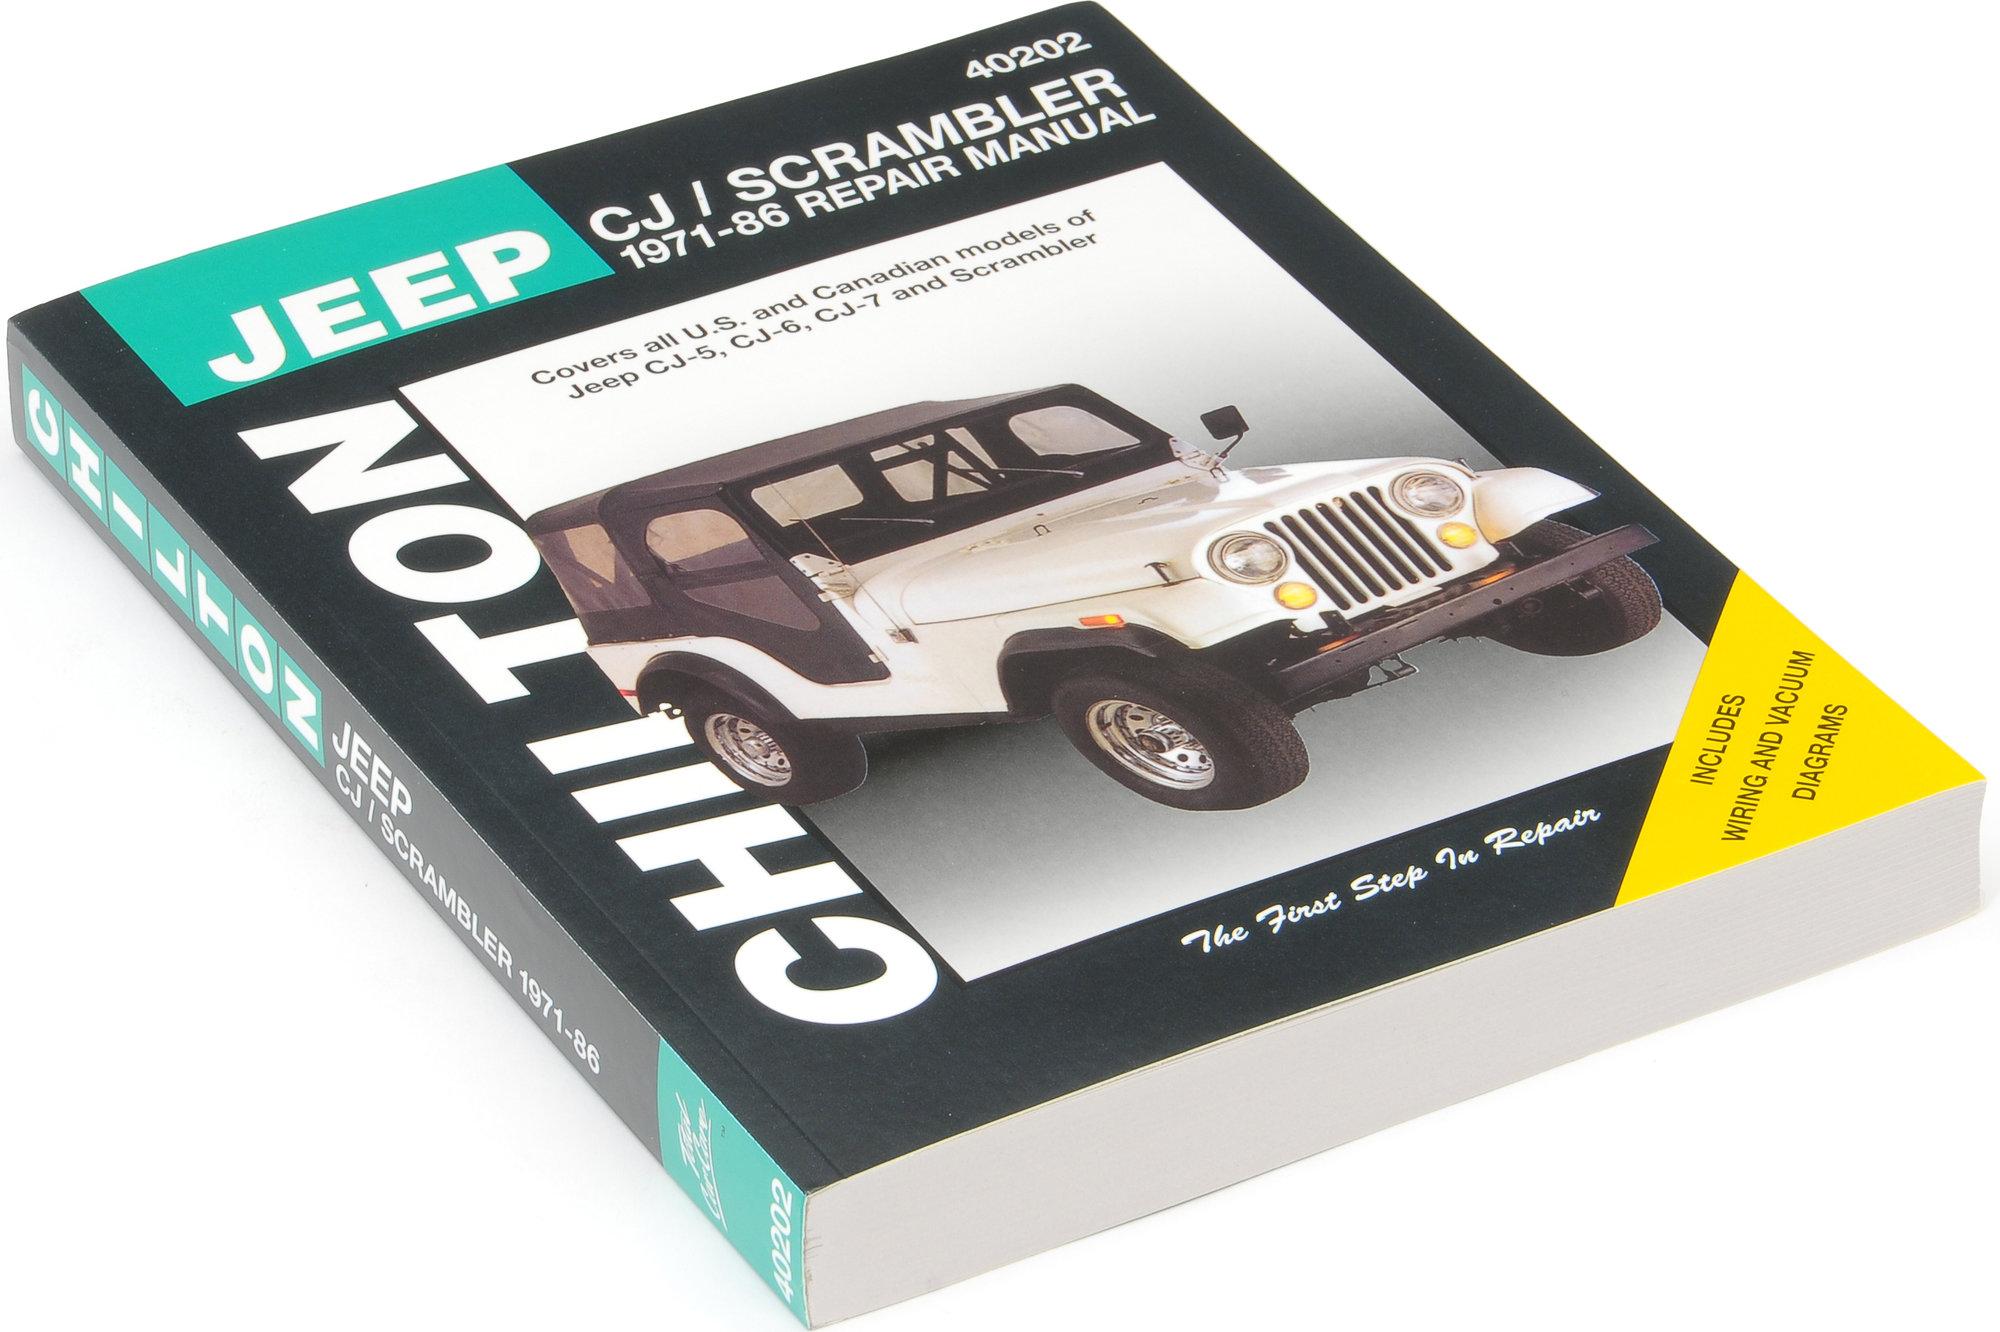 jeep cj5 repair manual pdf